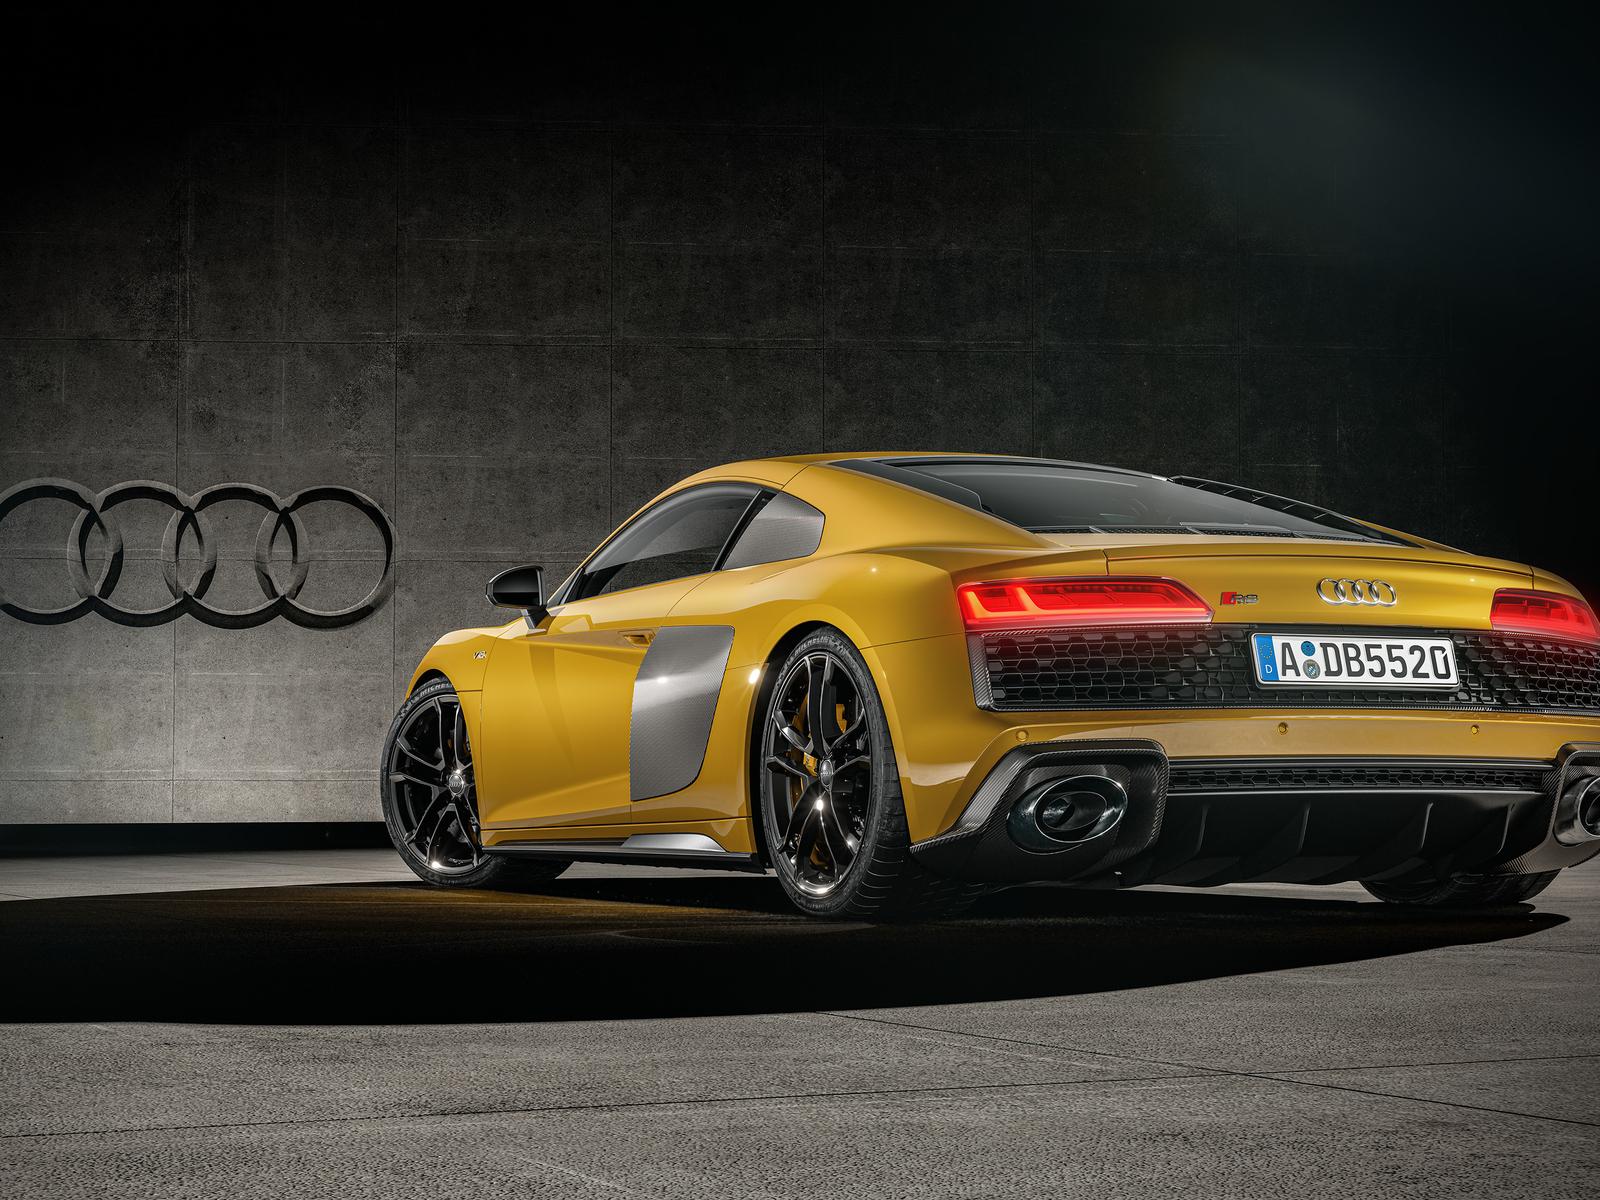 audi-r8-yellow-2020-xk.jpg